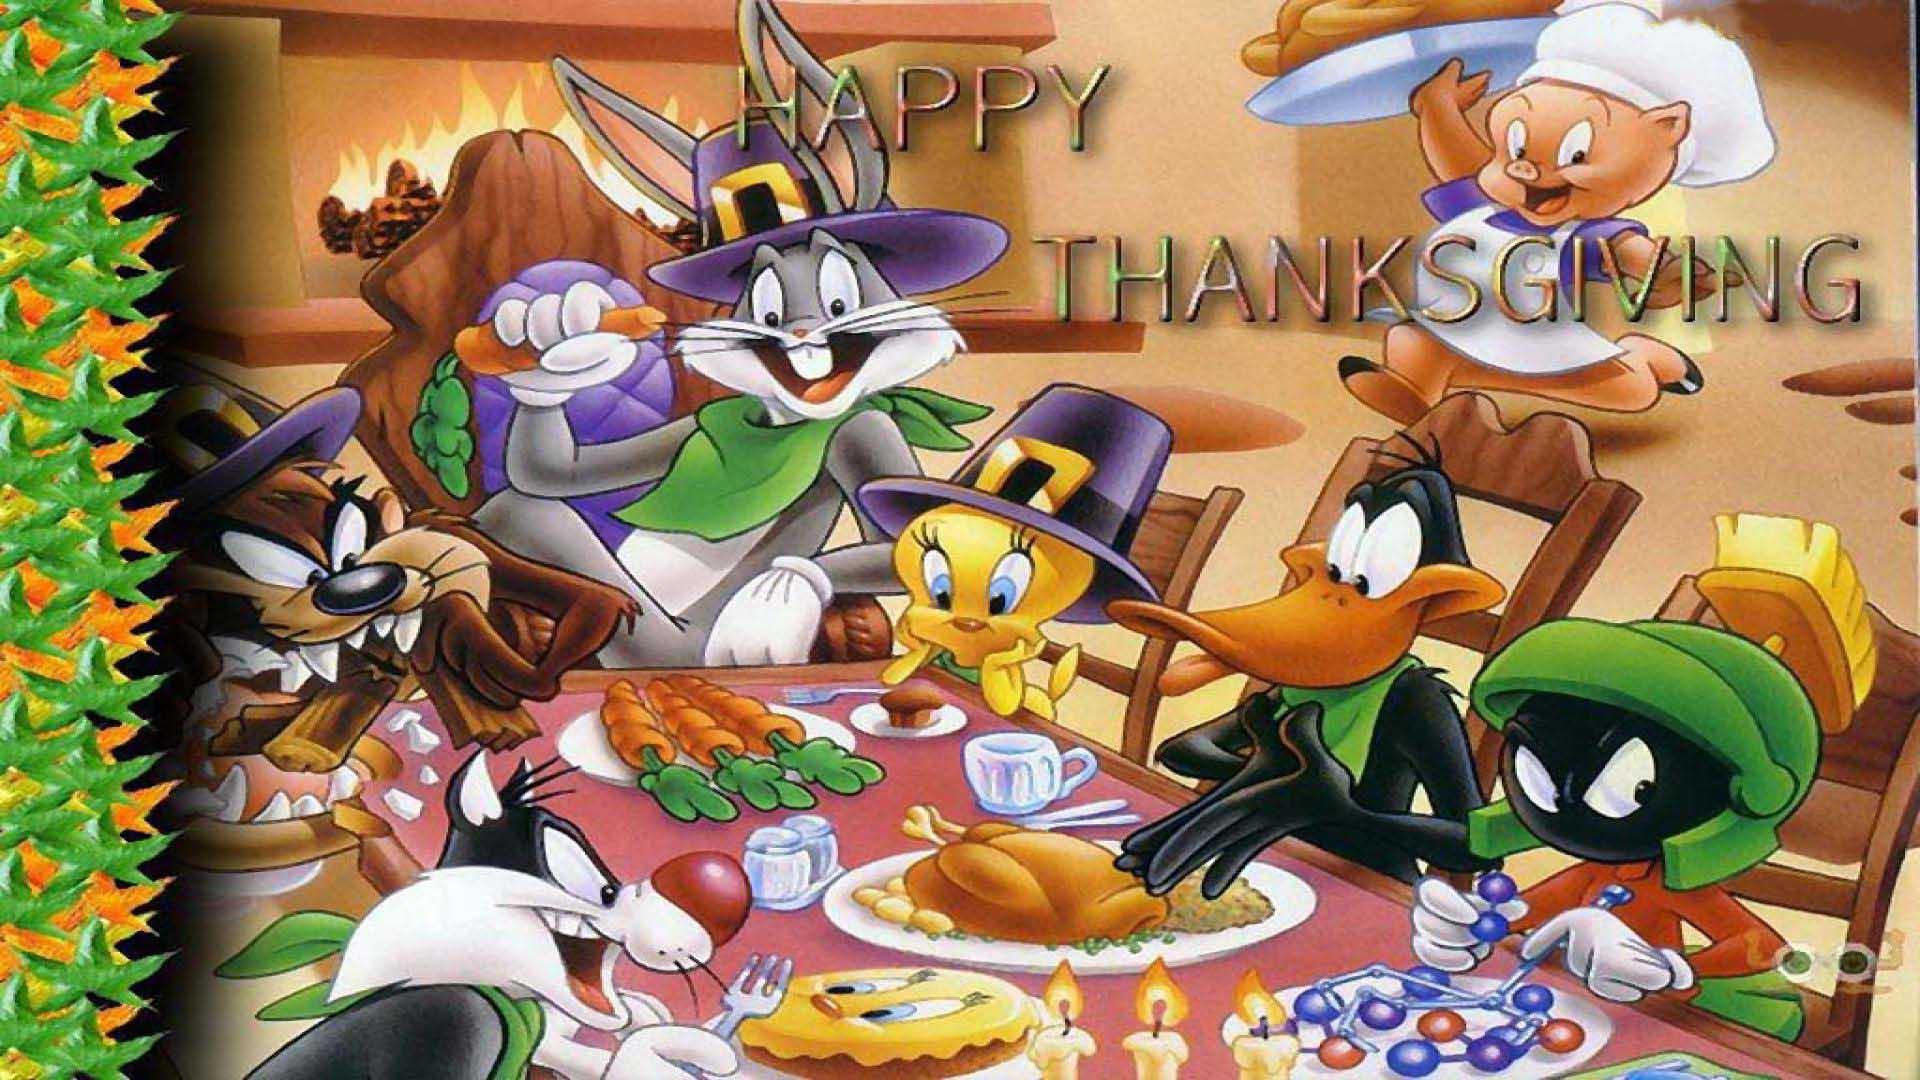 Thanksgiving Disney Wallpapers Wallpaper Cave